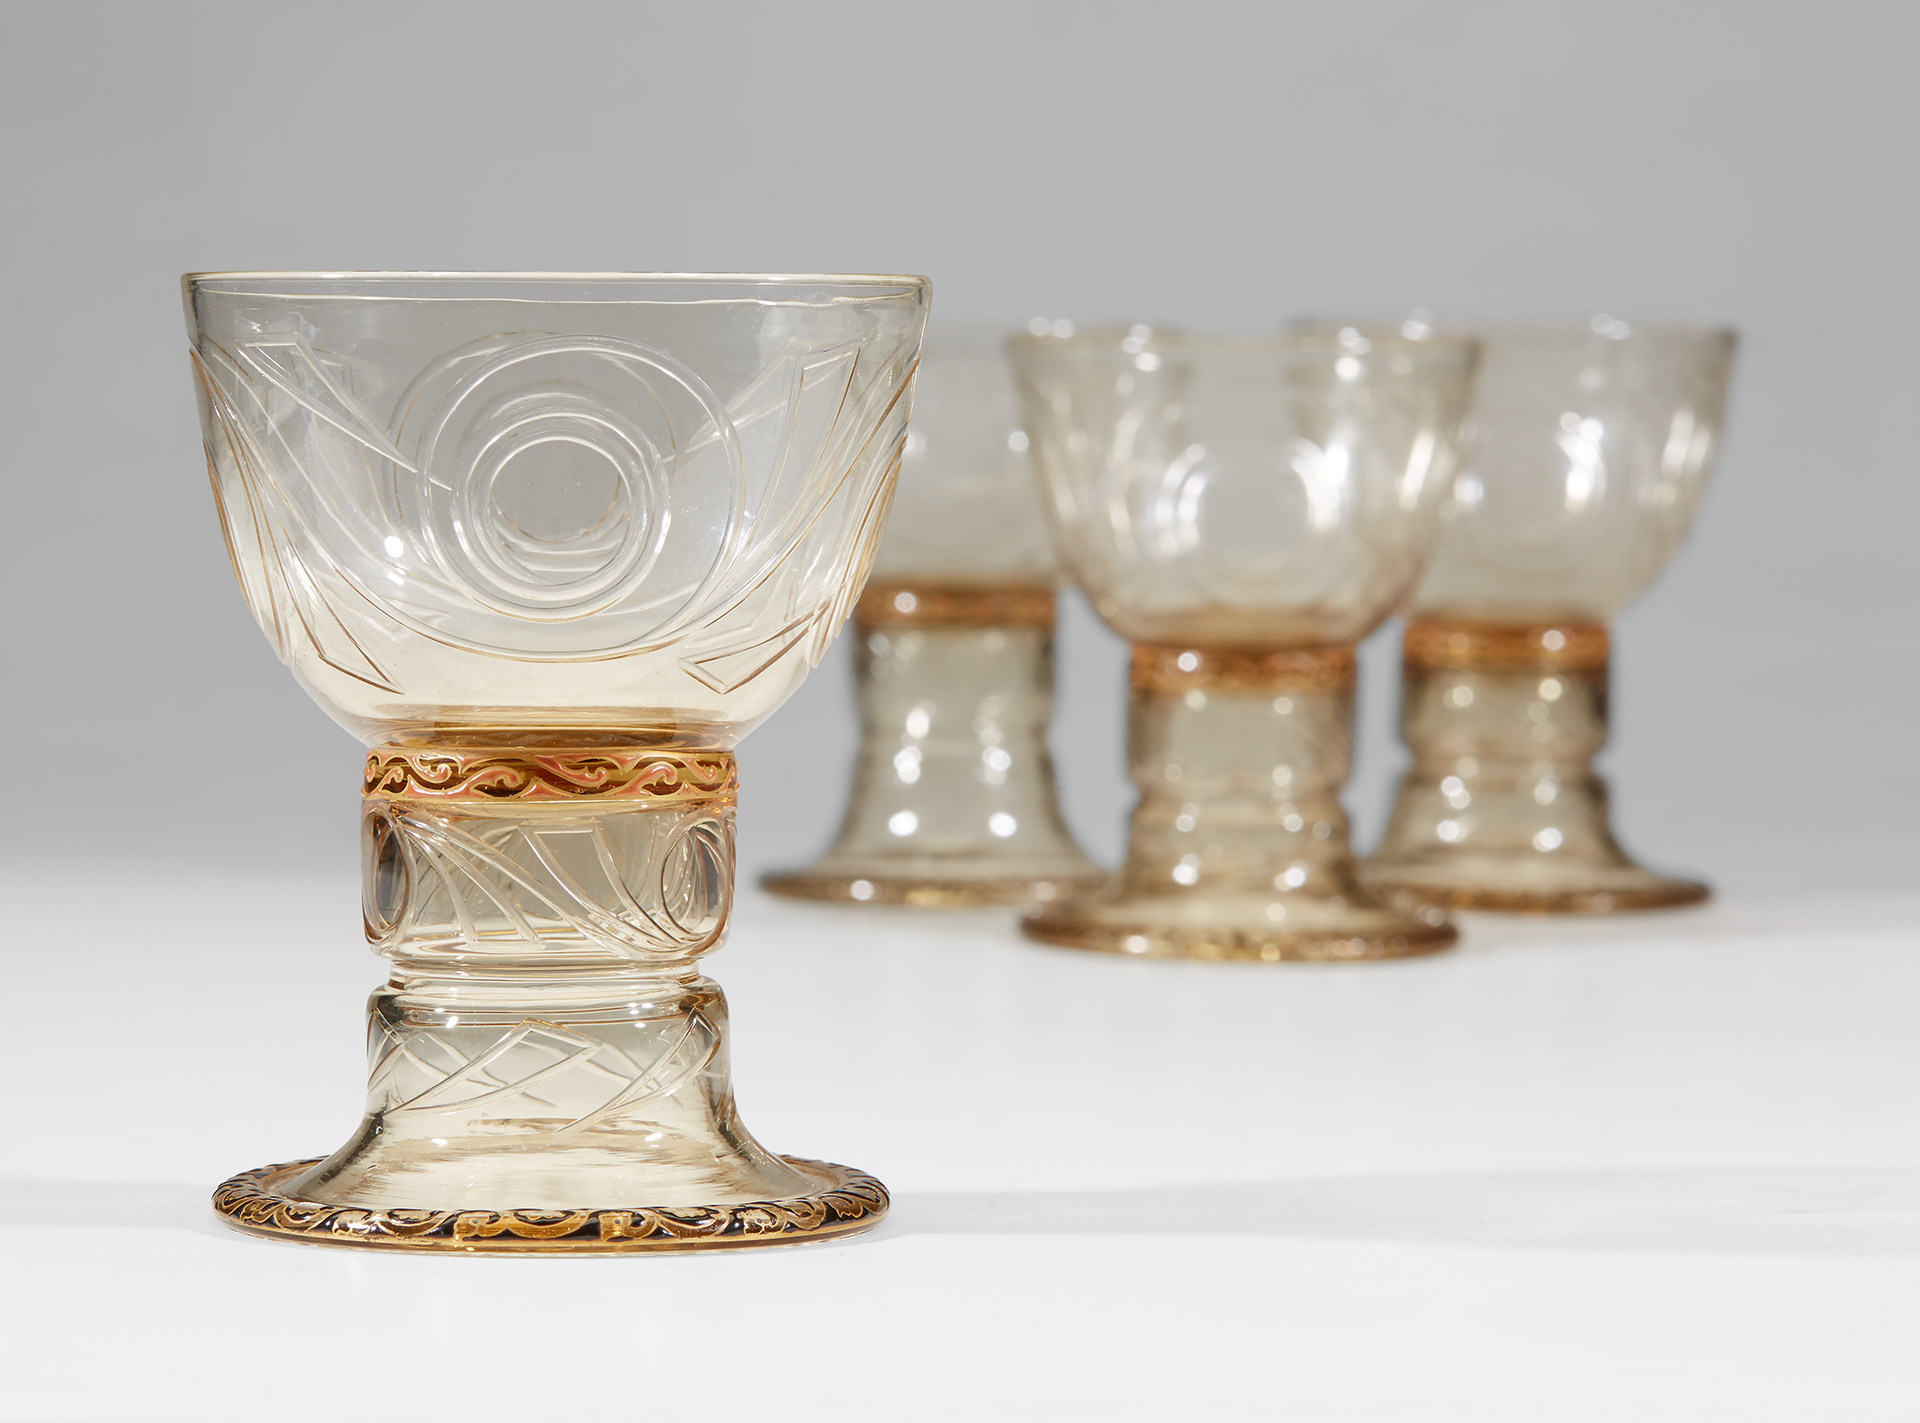 Lot 6 | émile Gallé, A Set of Twelve Drinking Glasses, France, circa 1895